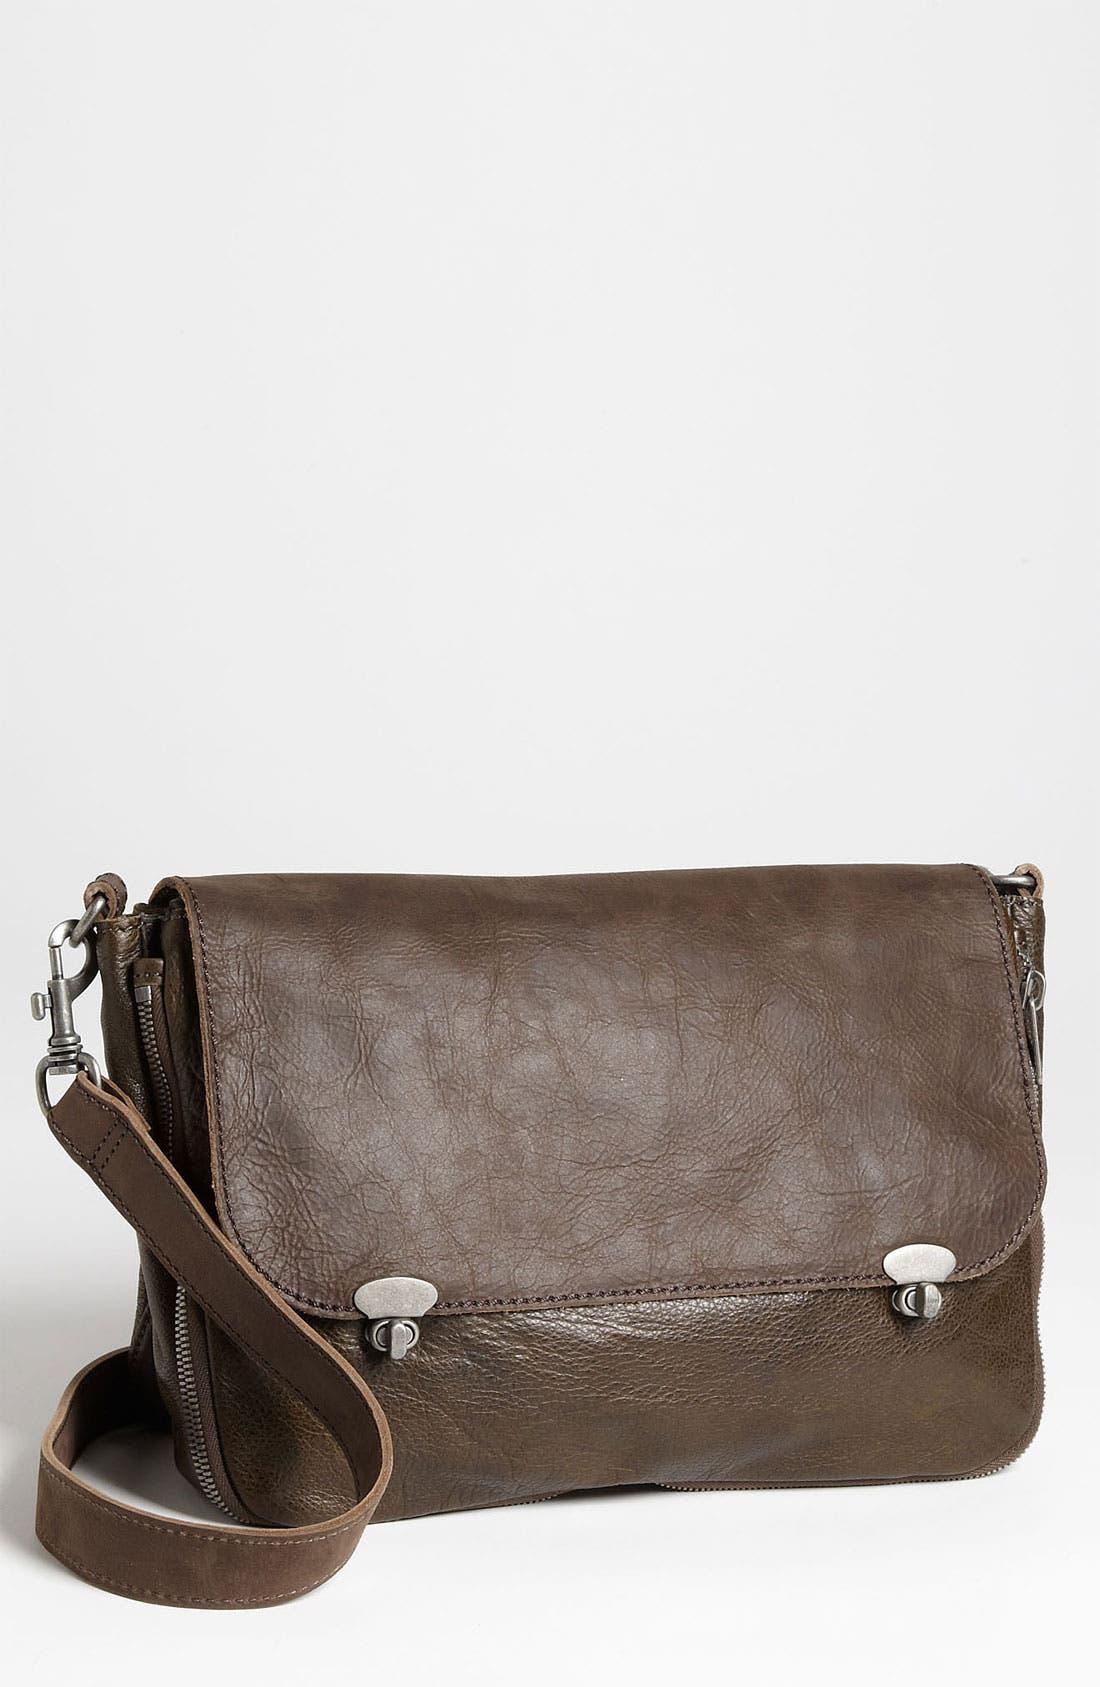 Main Image - Liebeskind 'Olivia' Crossbody Bag